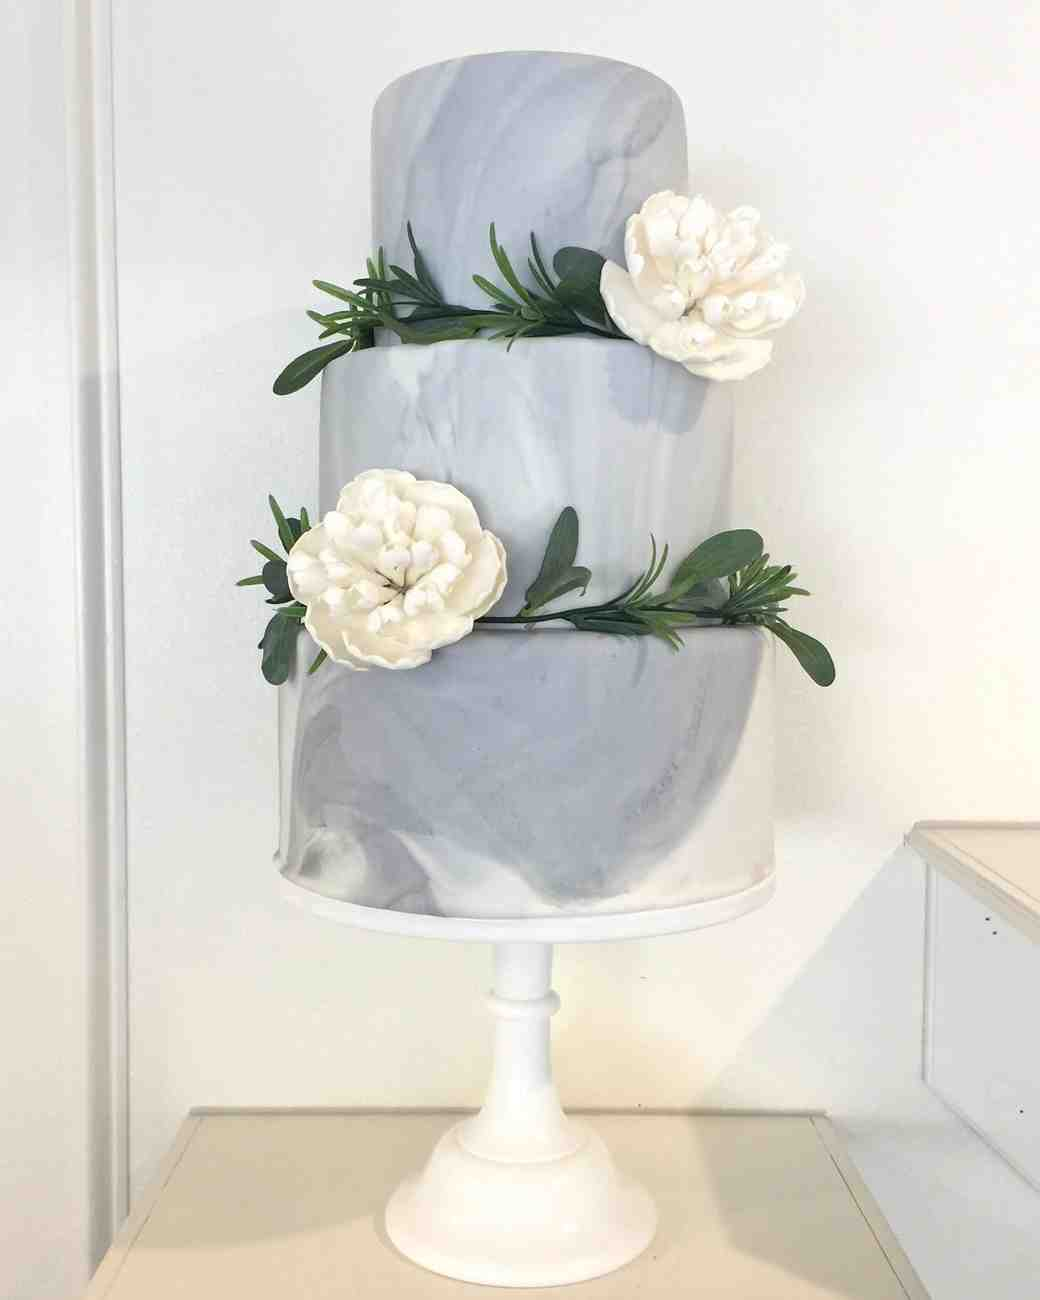 vegan-wedding-cake-half-baked-marble-0317_vert.jpg